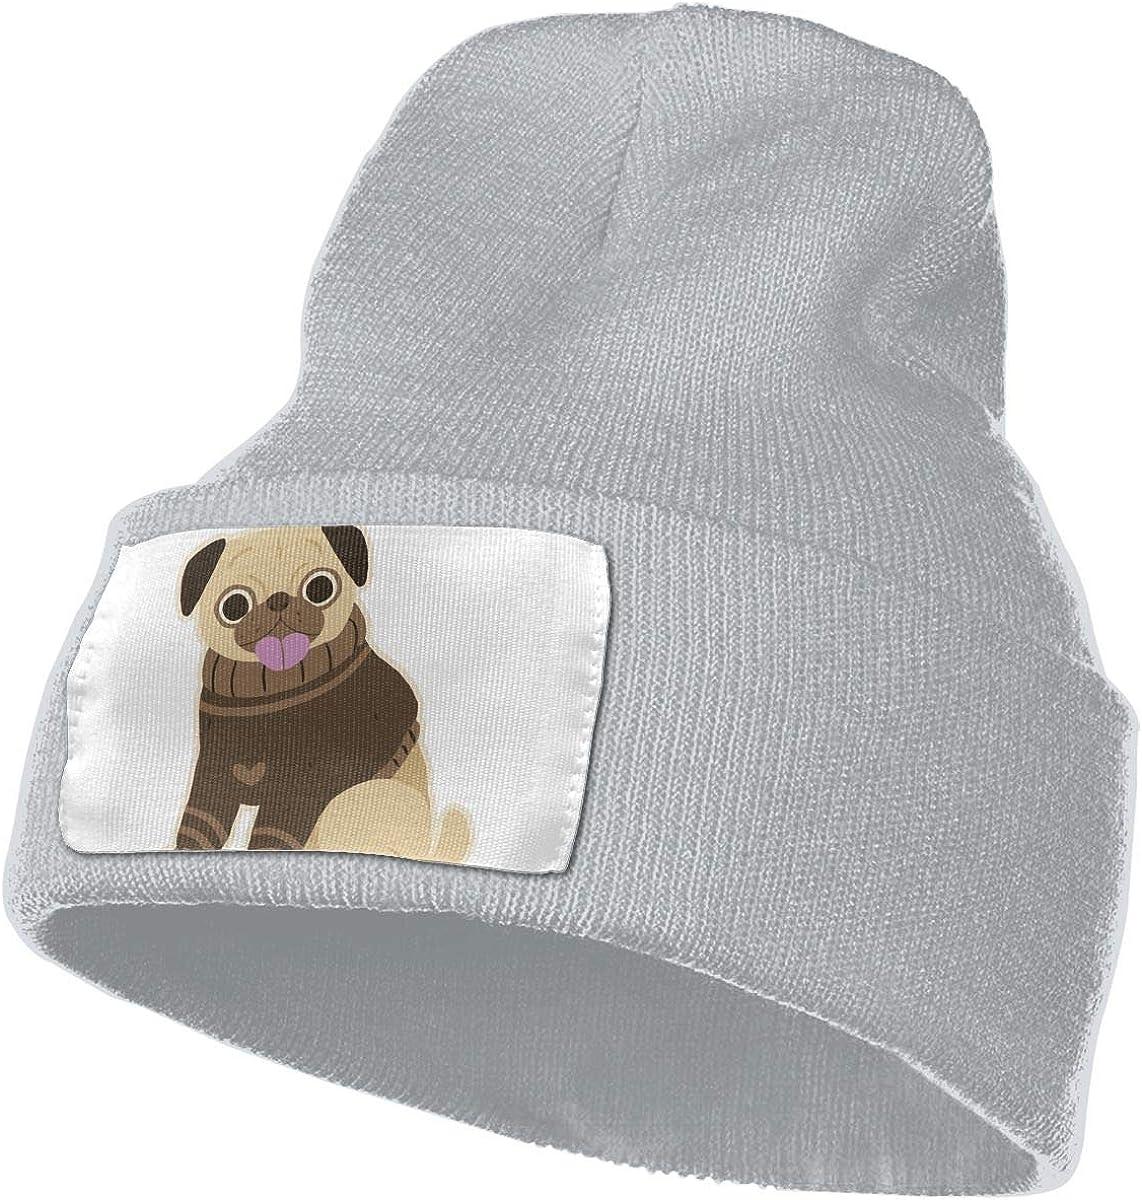 Real Men Love Pugs Dog Unisex Fashion Knitted Hat Luxury Hip-Hop Cap